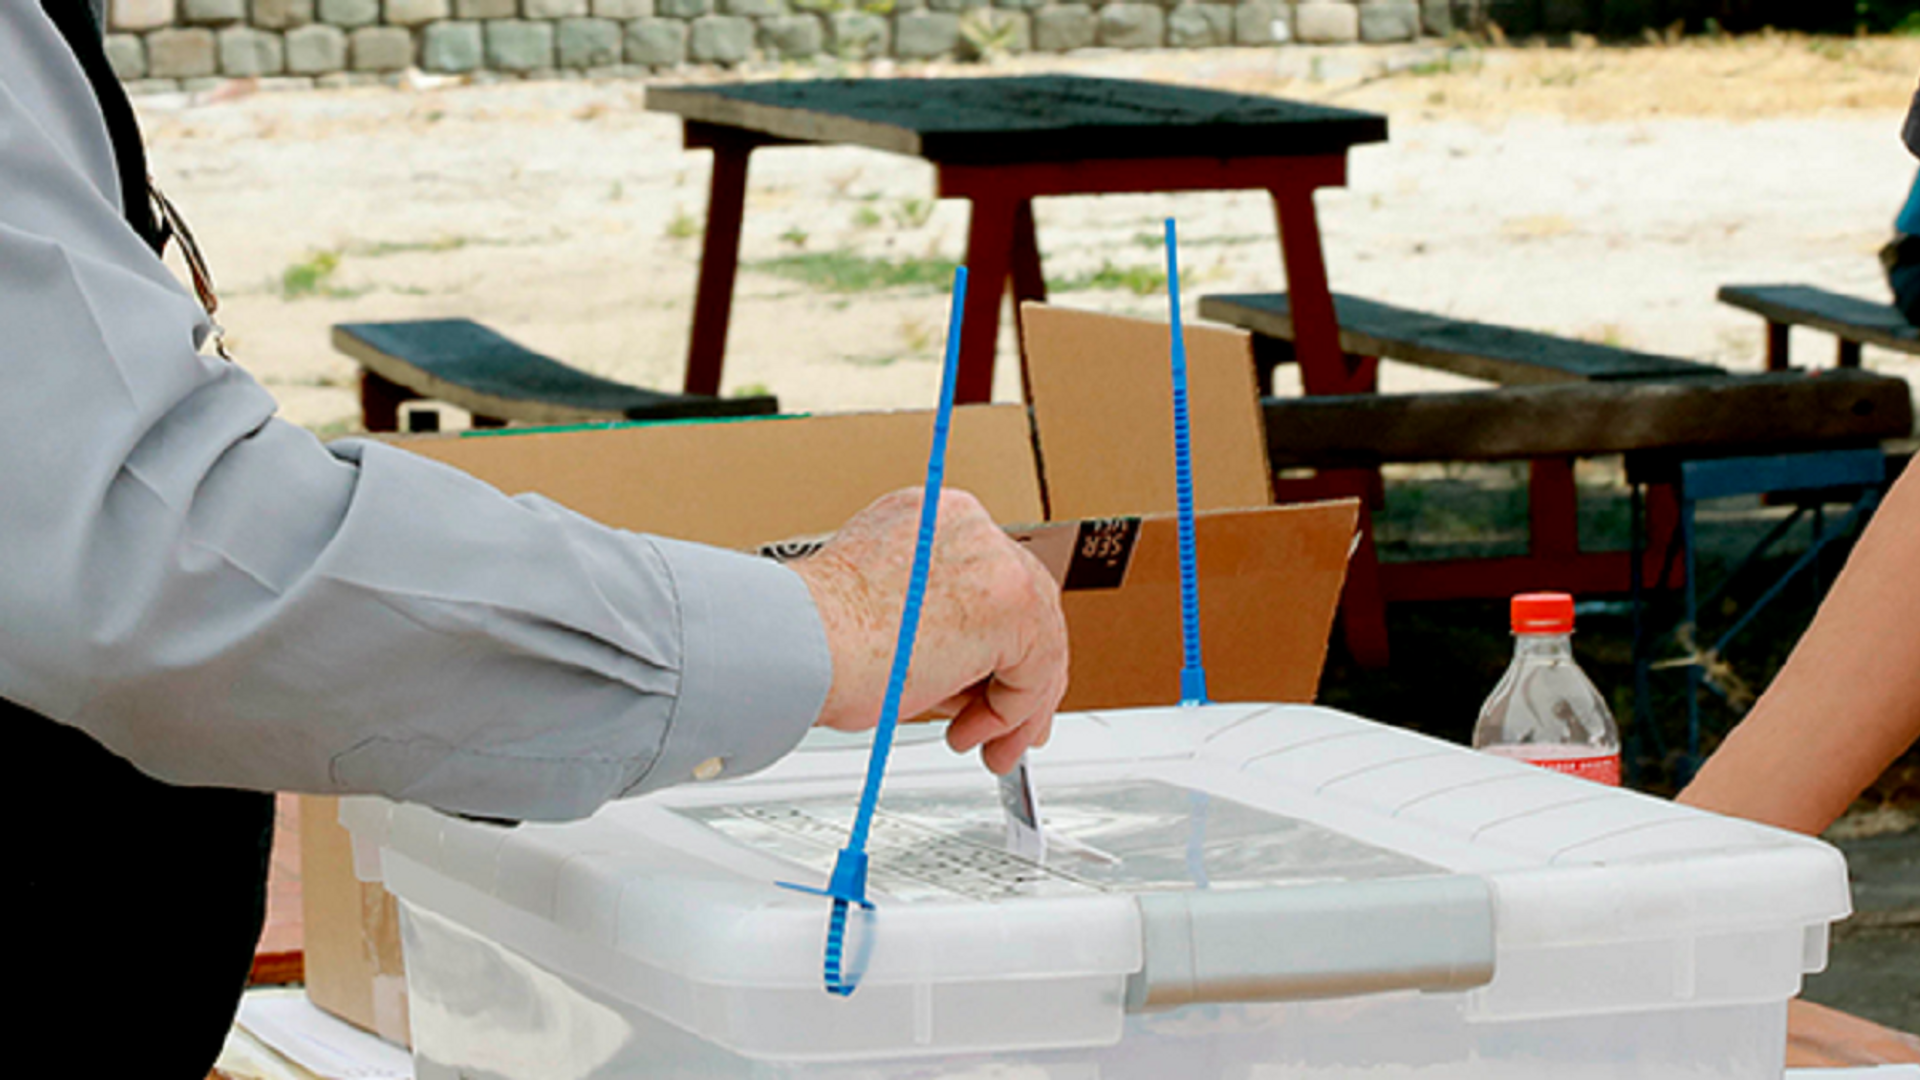 Un votante chileno sufragando - Sputnik Mundo, 1920, 30.03.2021